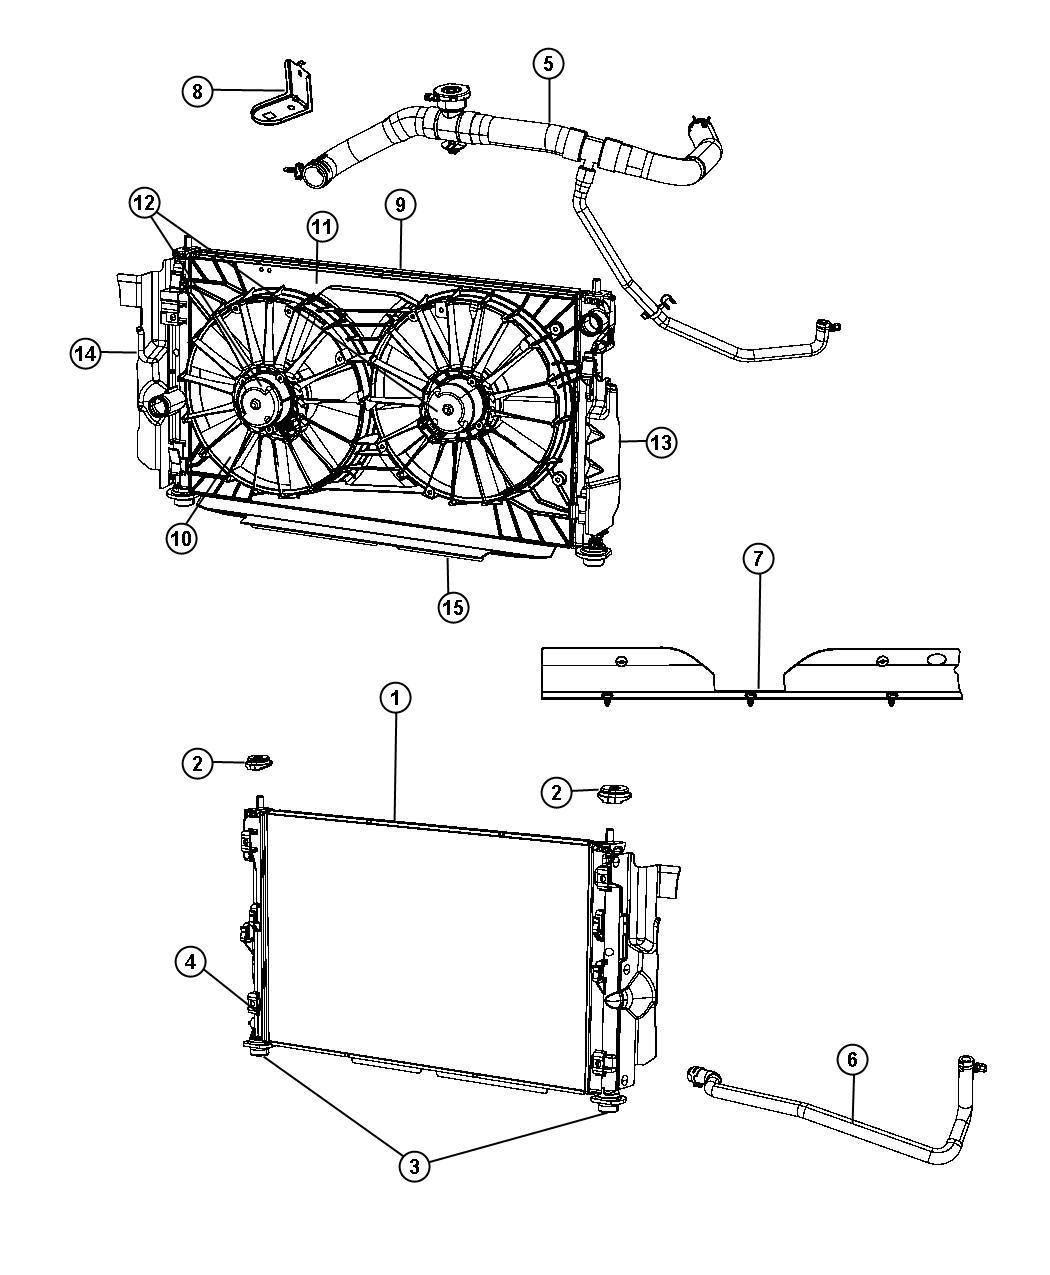 Jeep Compass Shroud Fan Modulemiddle Baffles